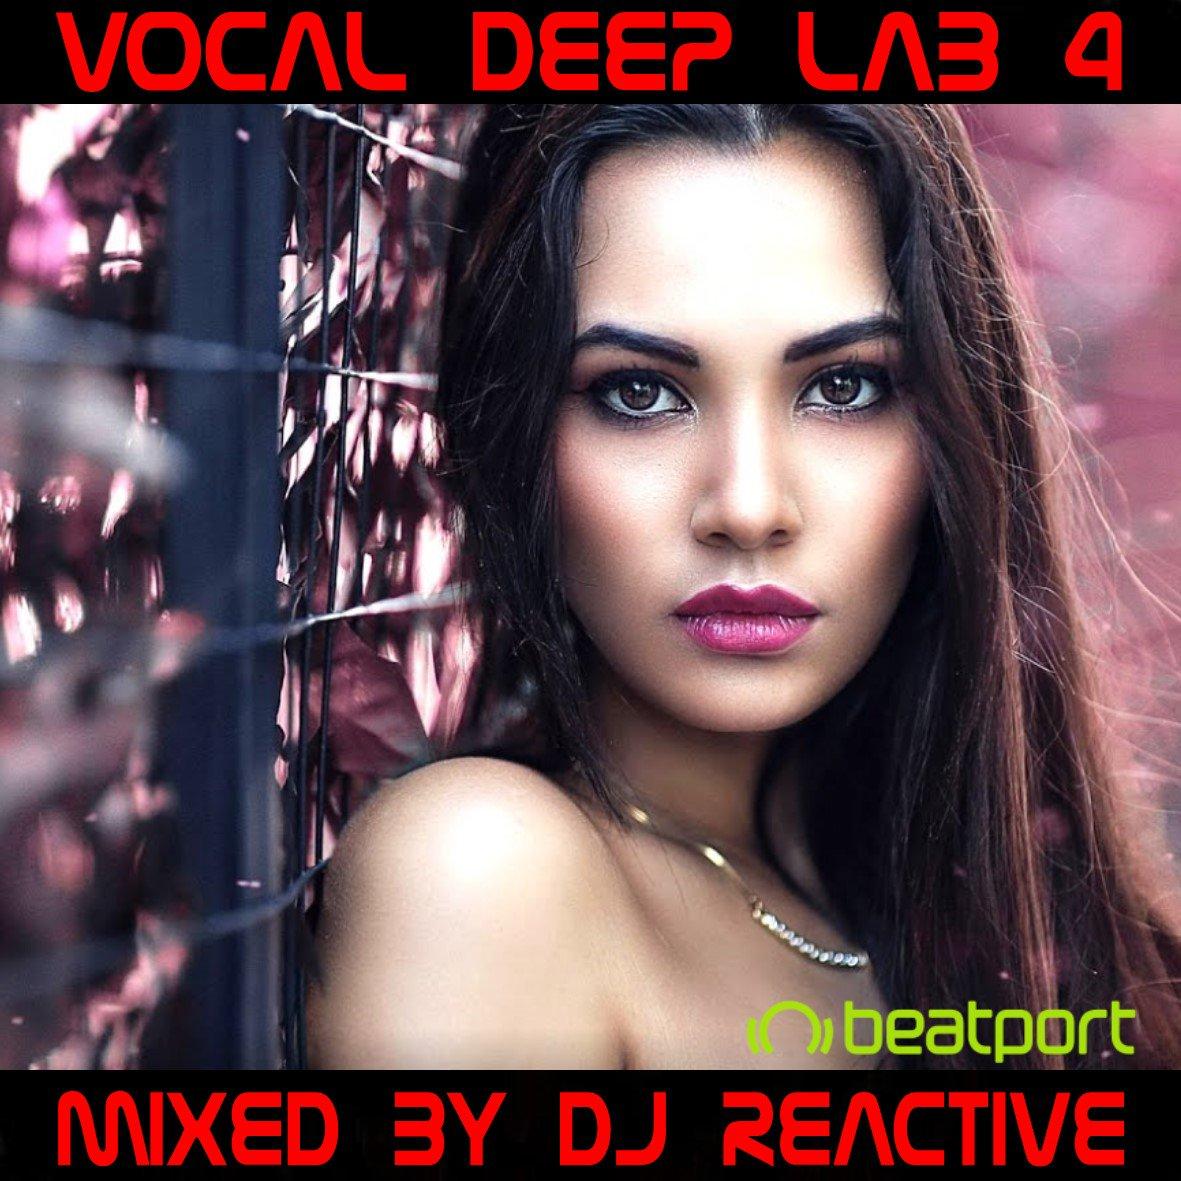 Now released on Beatport Vocal Deep Lab Vol 4 (Mixed by dj Reactive)  http:// mixes.beatport.com/mix/vocal-deep -lab-volume-4-mixed-by-dj-reactive/285739 &nbsp; …  #deep #house #djreactive #dj #partymusic #l4l <br>http://pic.twitter.com/FIjQ6nREFF